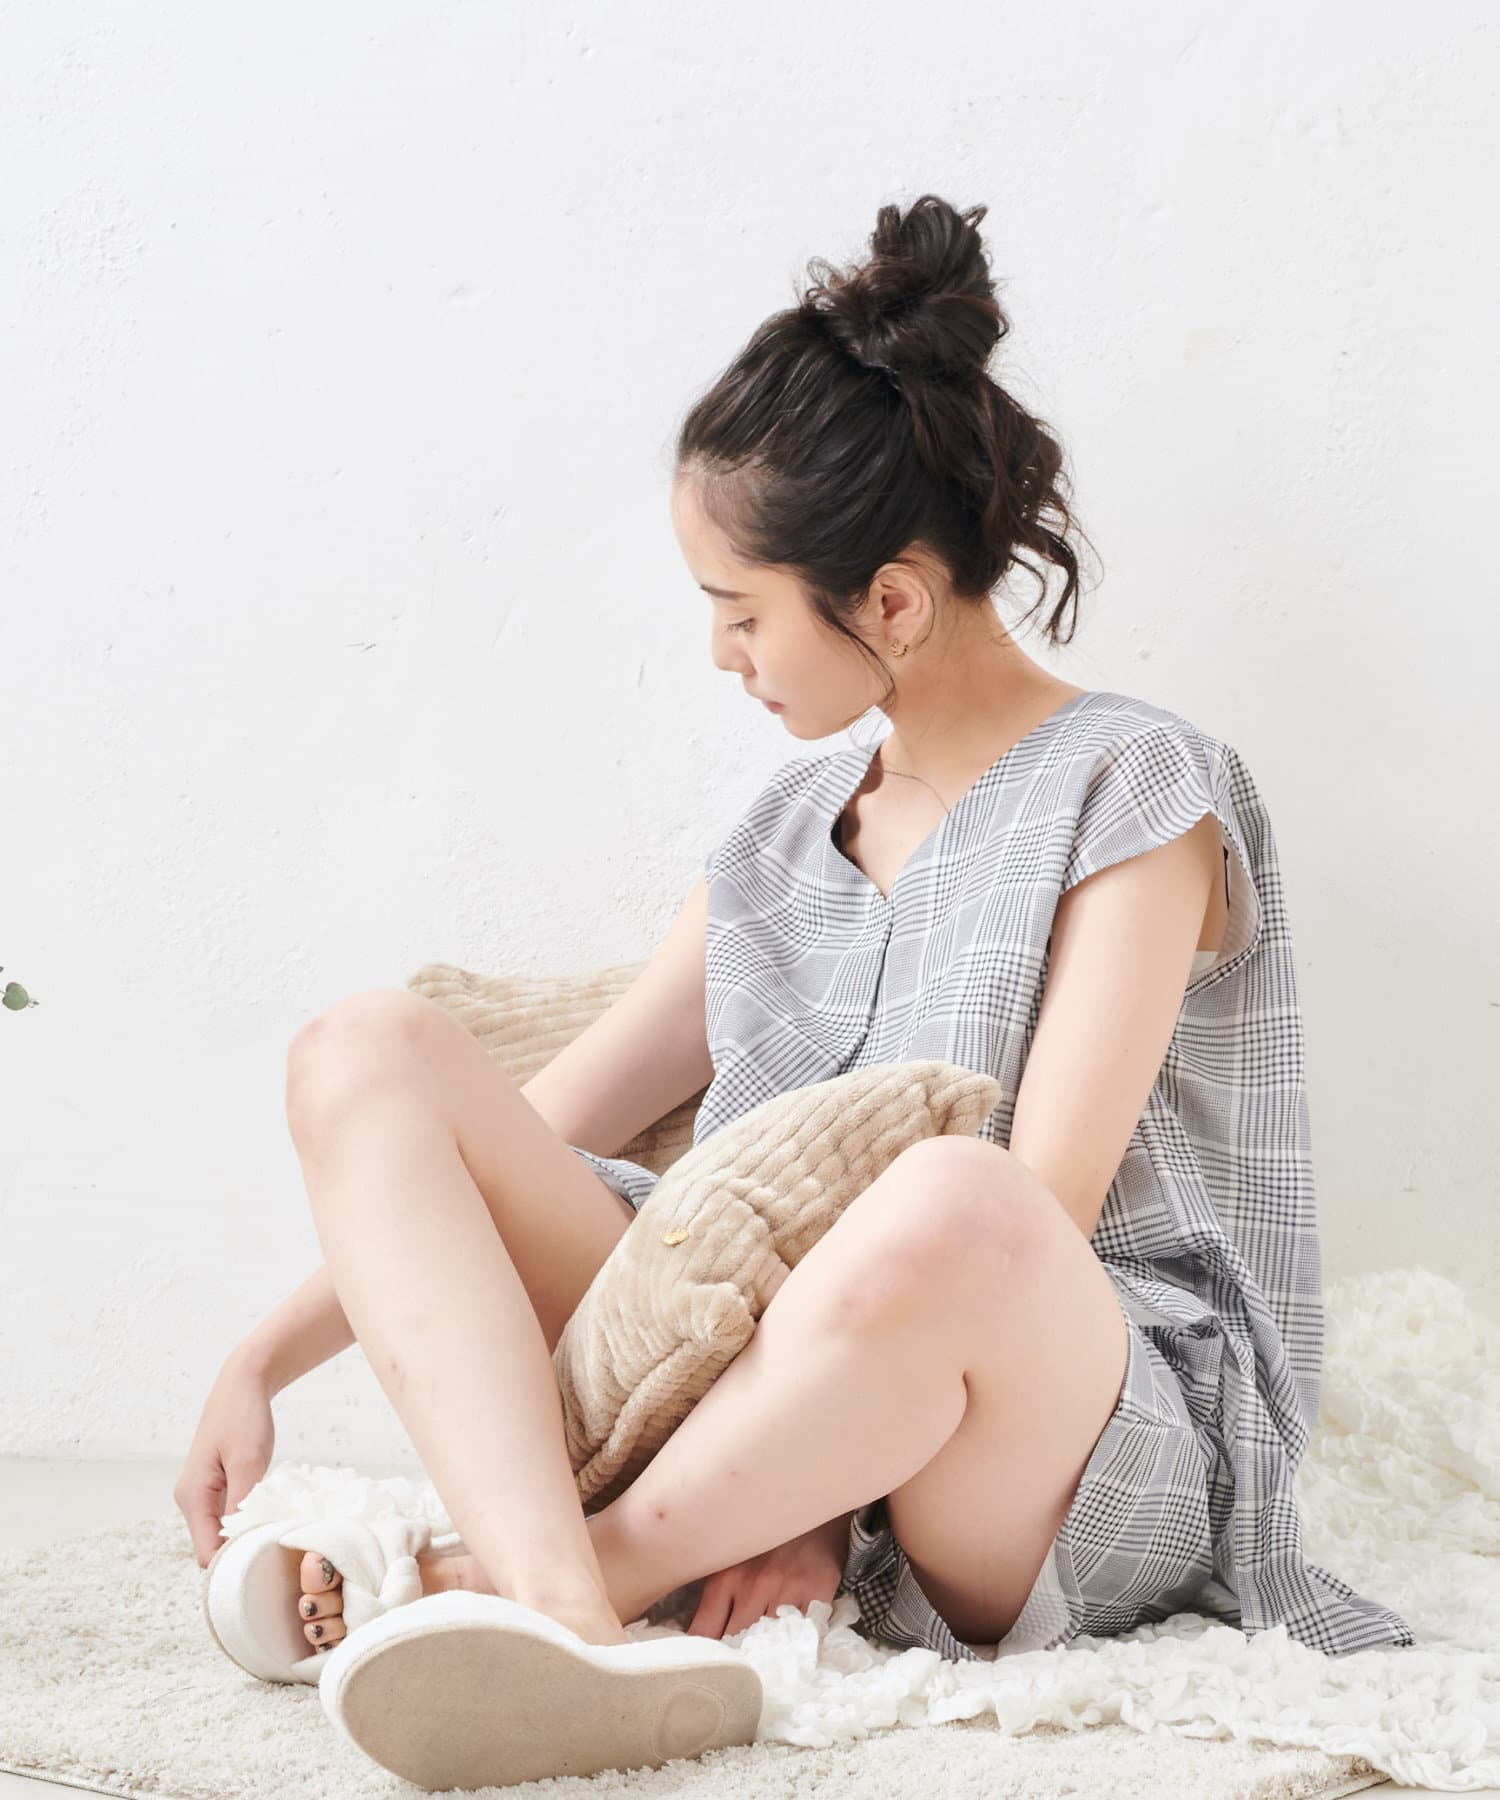 TERRITOIRE(テリトワール) 【サマーコットン】オリジナル柄ふんわりガーゼチュニック ルームウエアセット